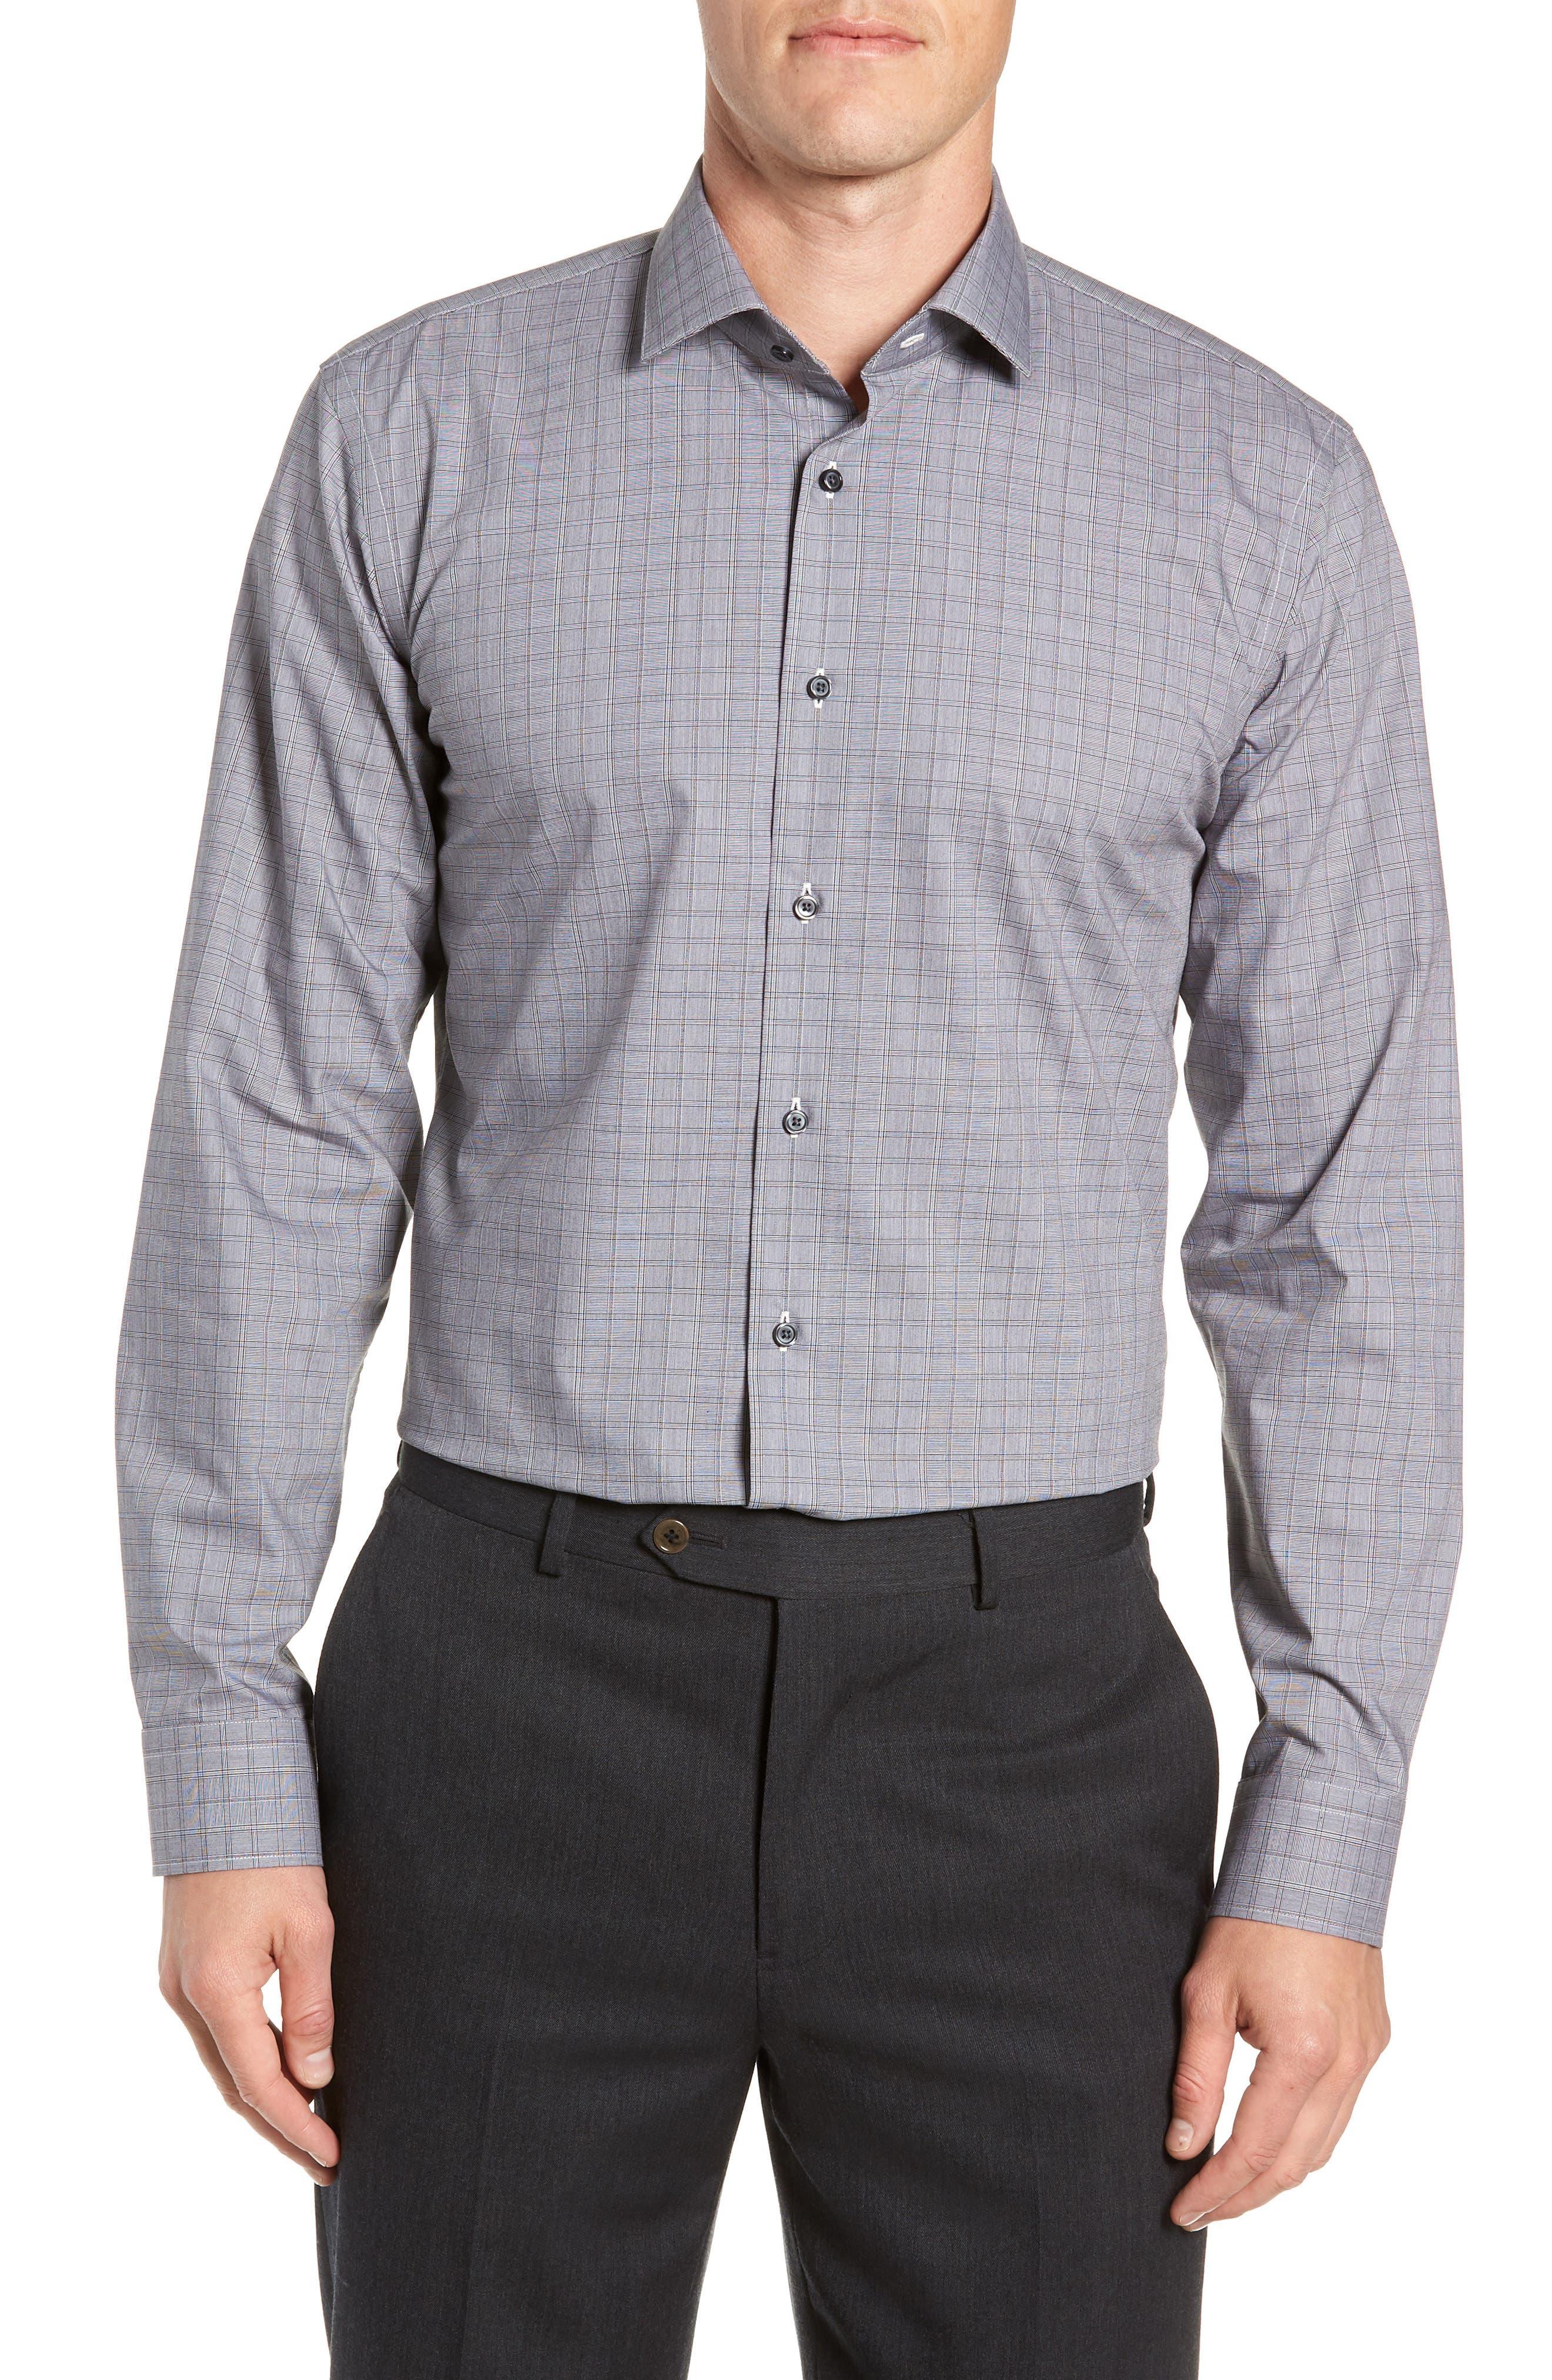 Trim Fit Stretch Non-Iron Check Dress Shirt,                             Main thumbnail 1, color,                             BLACK METEORITE